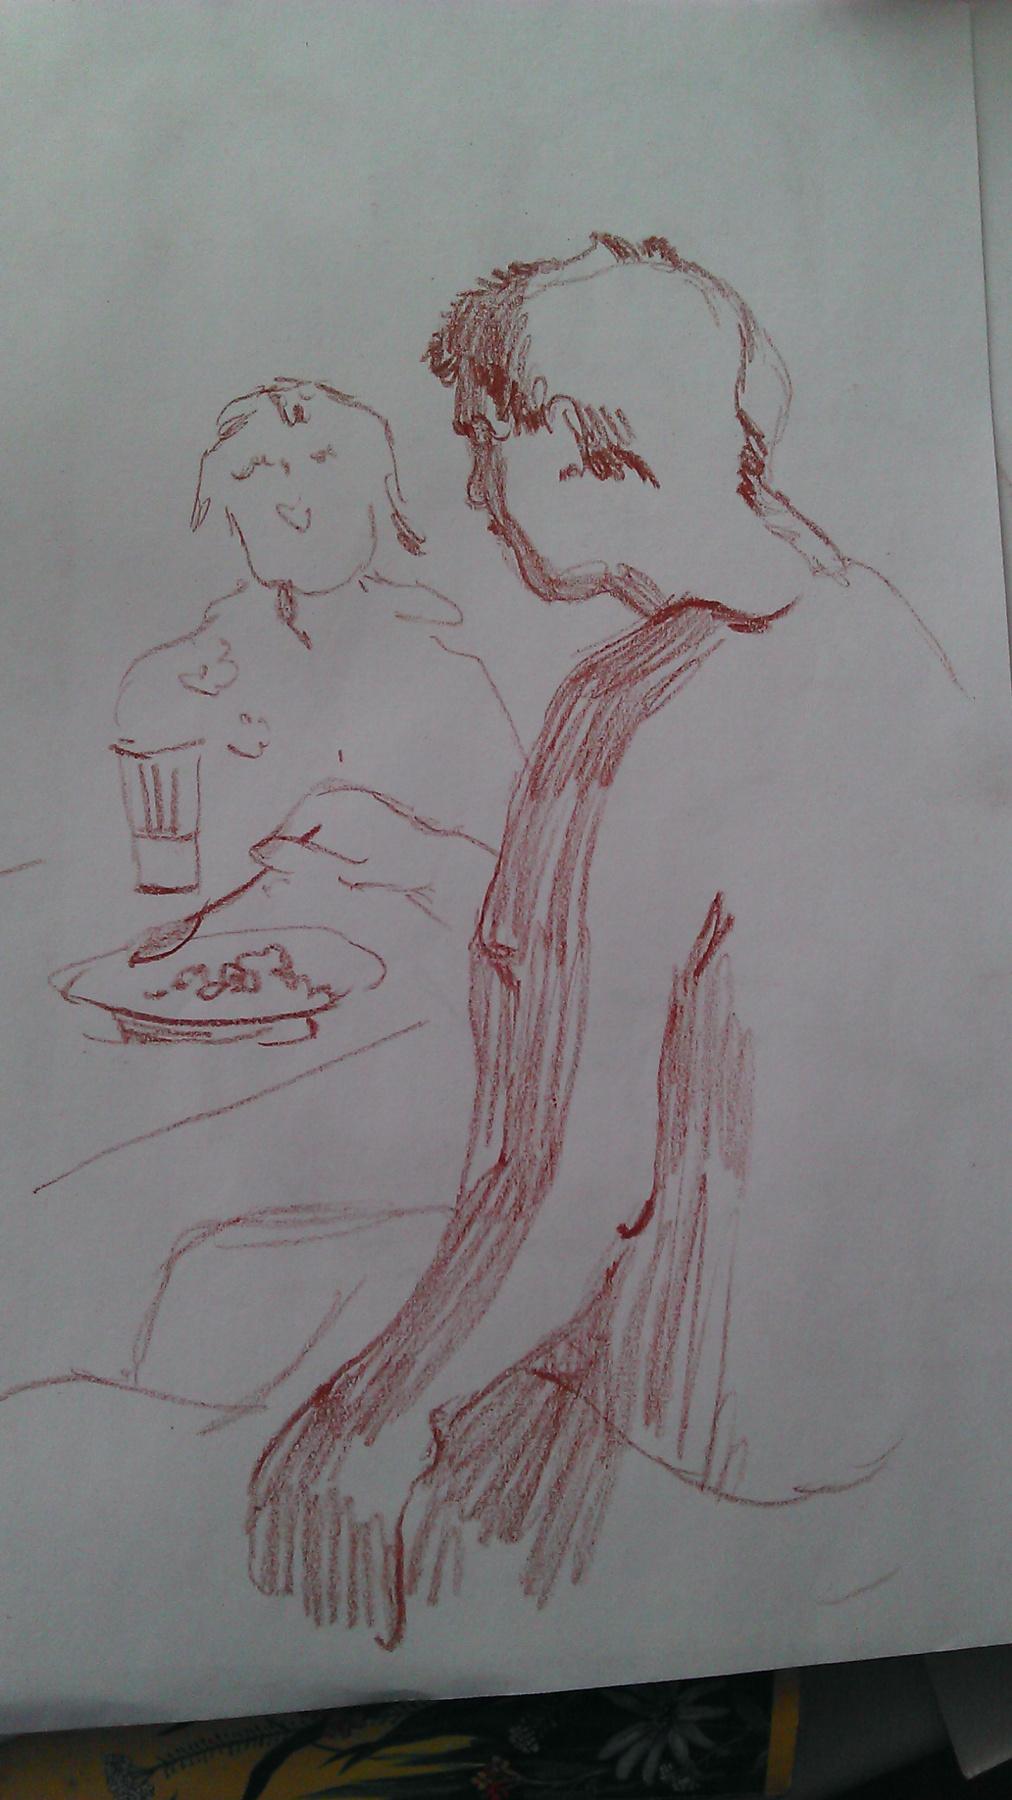 Софья Александровна Лепоринская. Breakfast